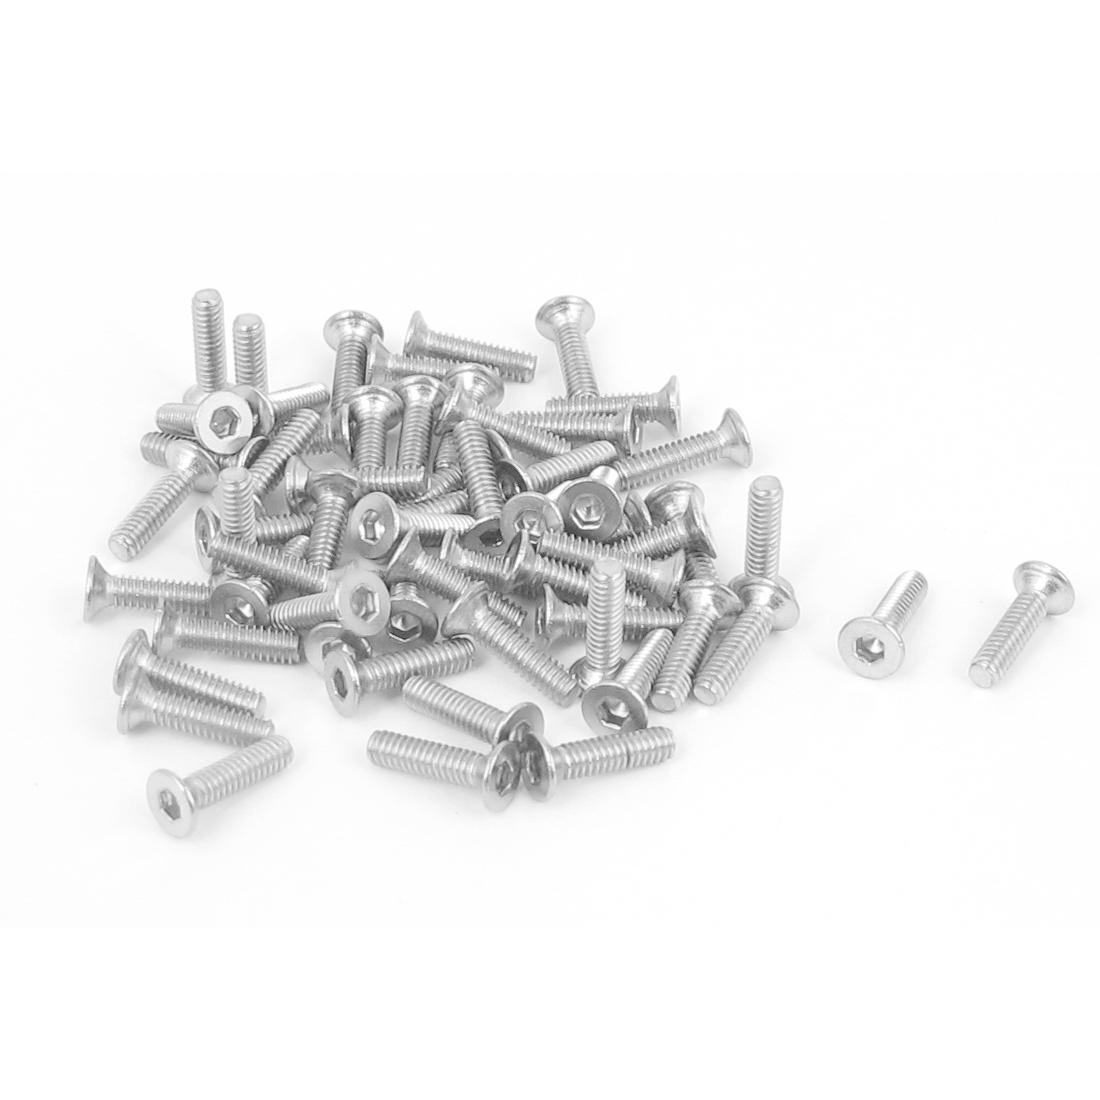 M2 x 8mm Metric 304 Stainless Steel Hex Socket Countersunk Flat Head Screw Bolts 50pcs